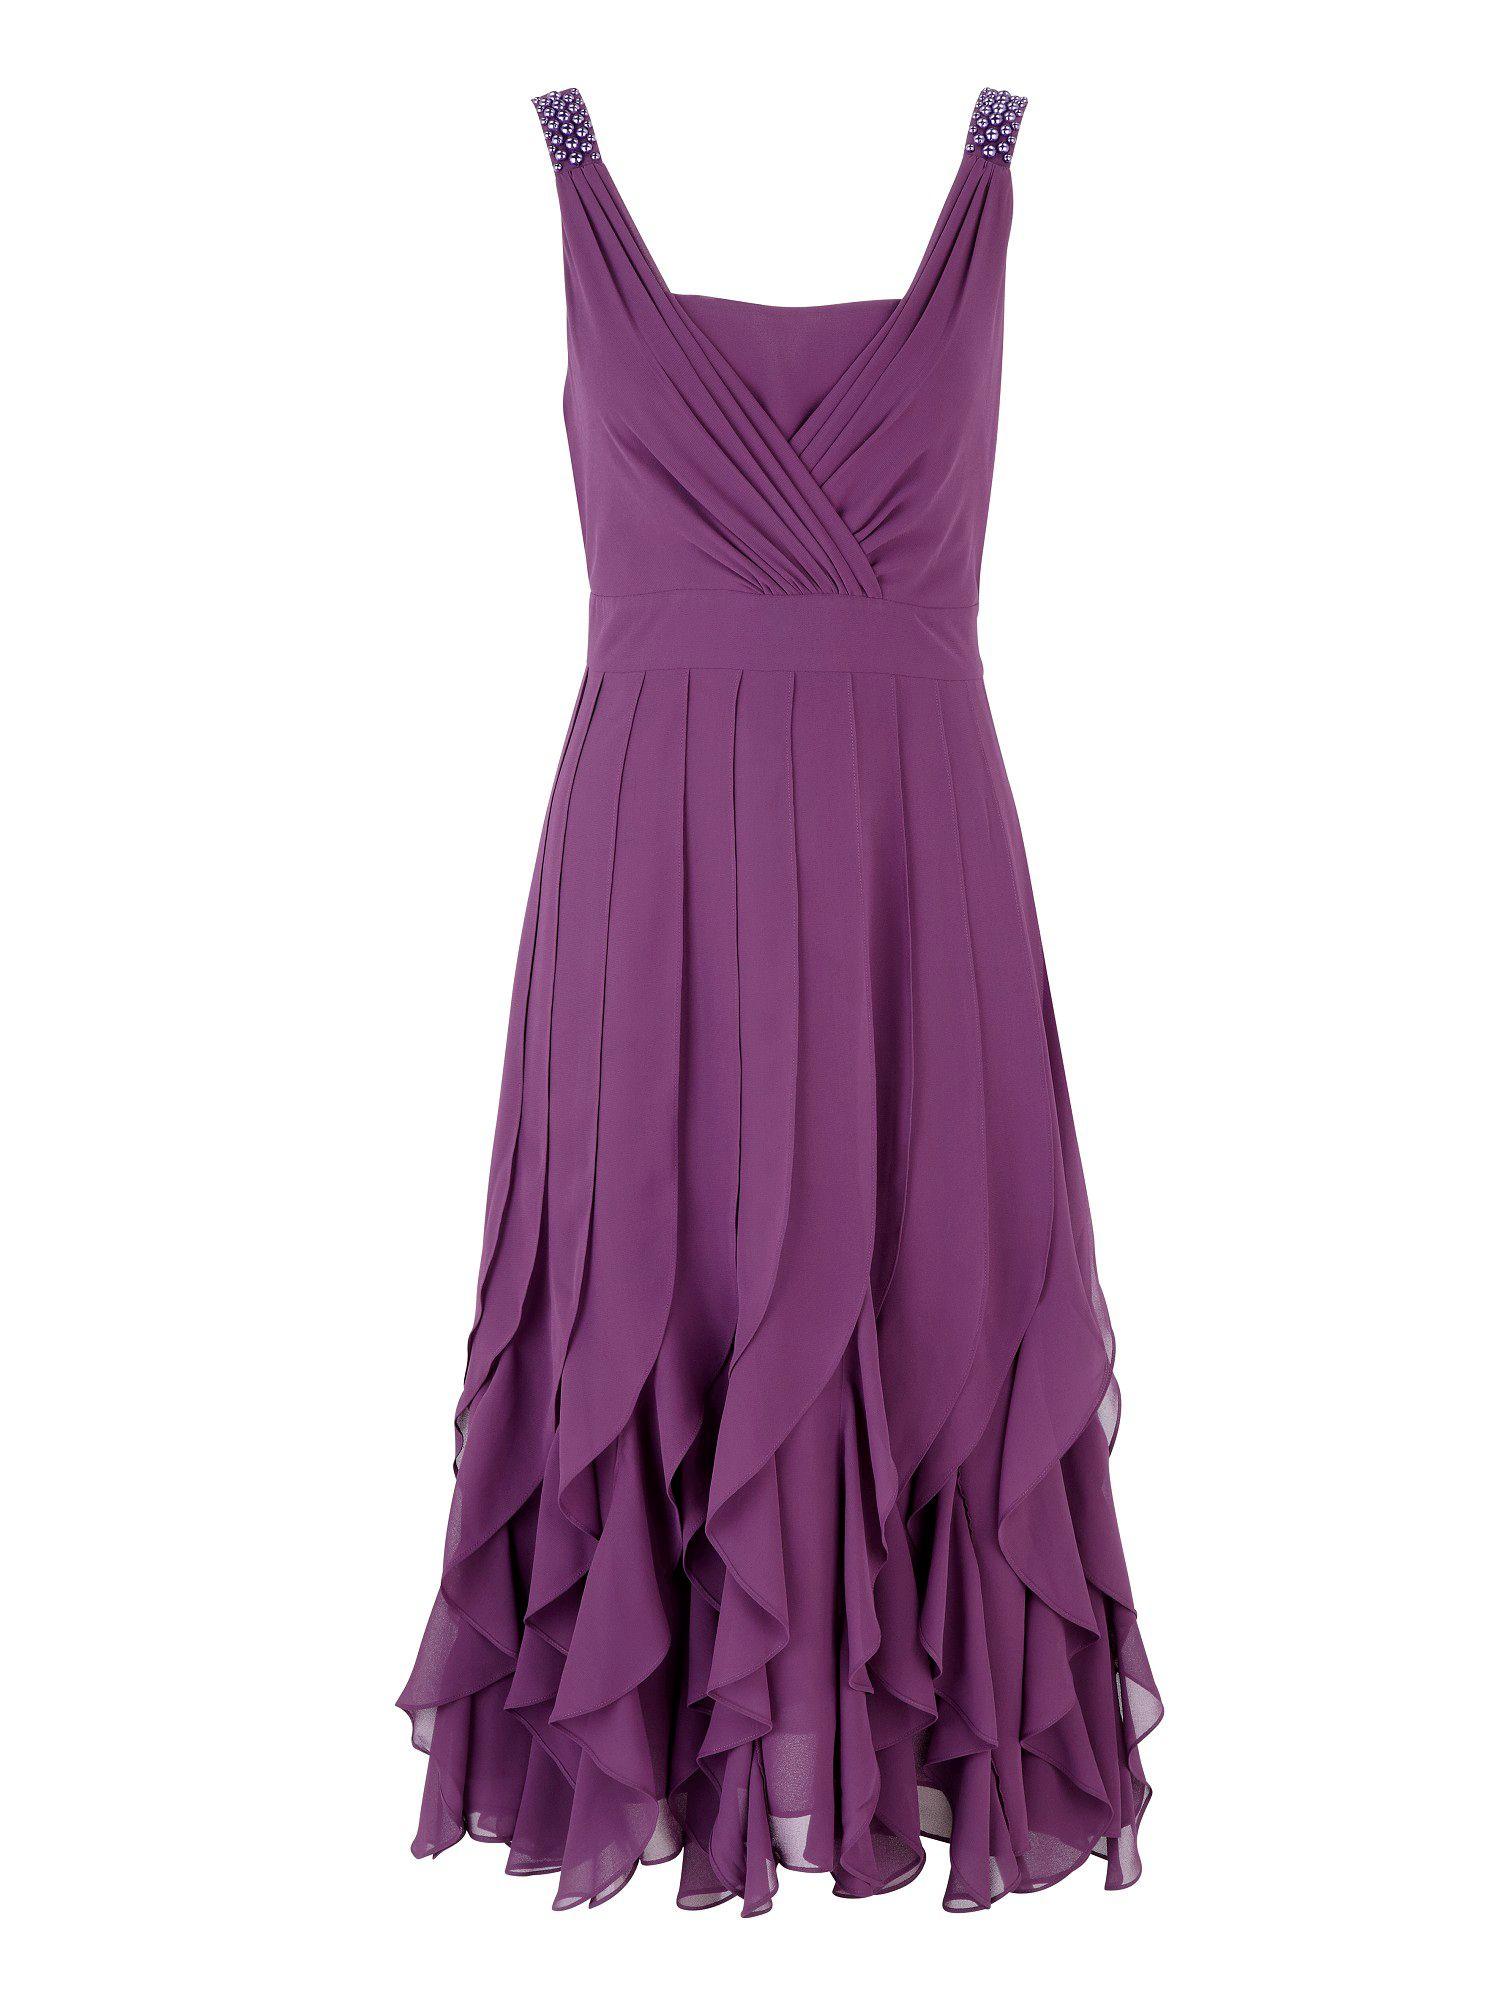 Purple Mother Of The Bride Dresses MEMEs